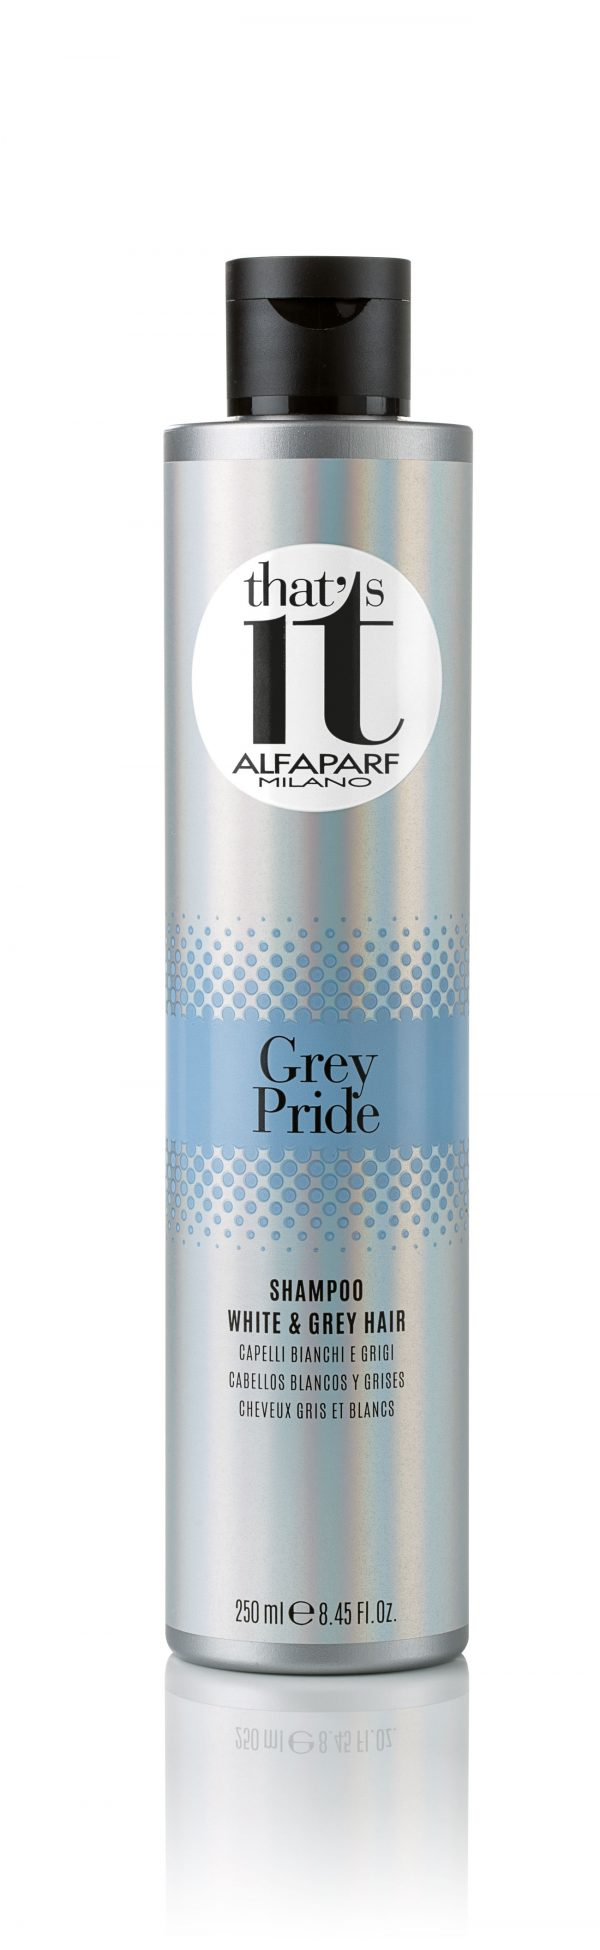 Thats It Alfaparf Milano Grey Pride Shampoo 250ml